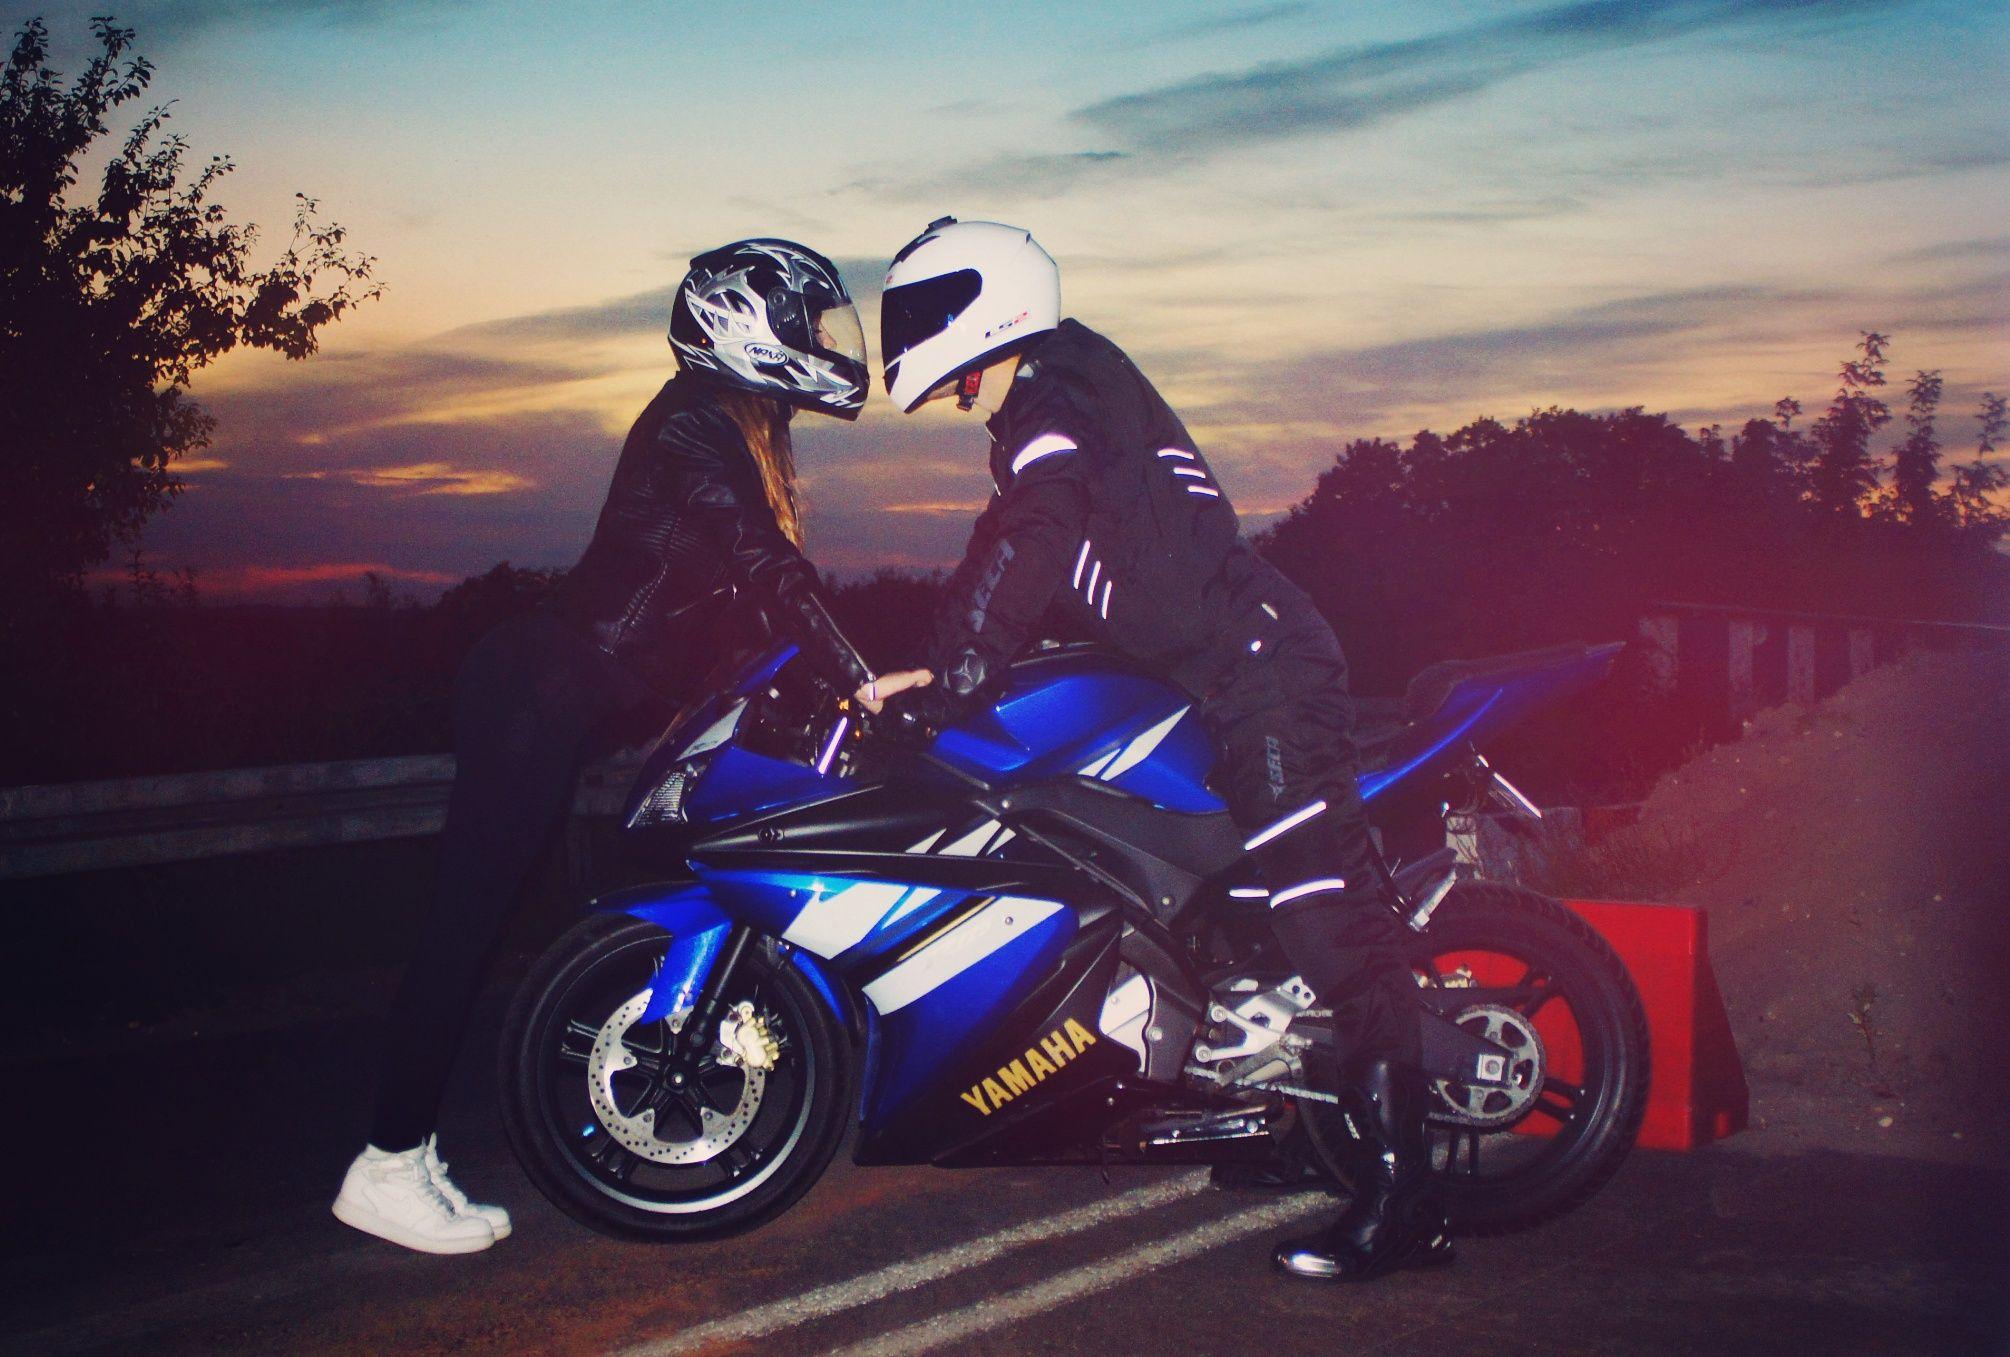 Motorcycle Motocykle Love Couple Cute Tumblr Motolove